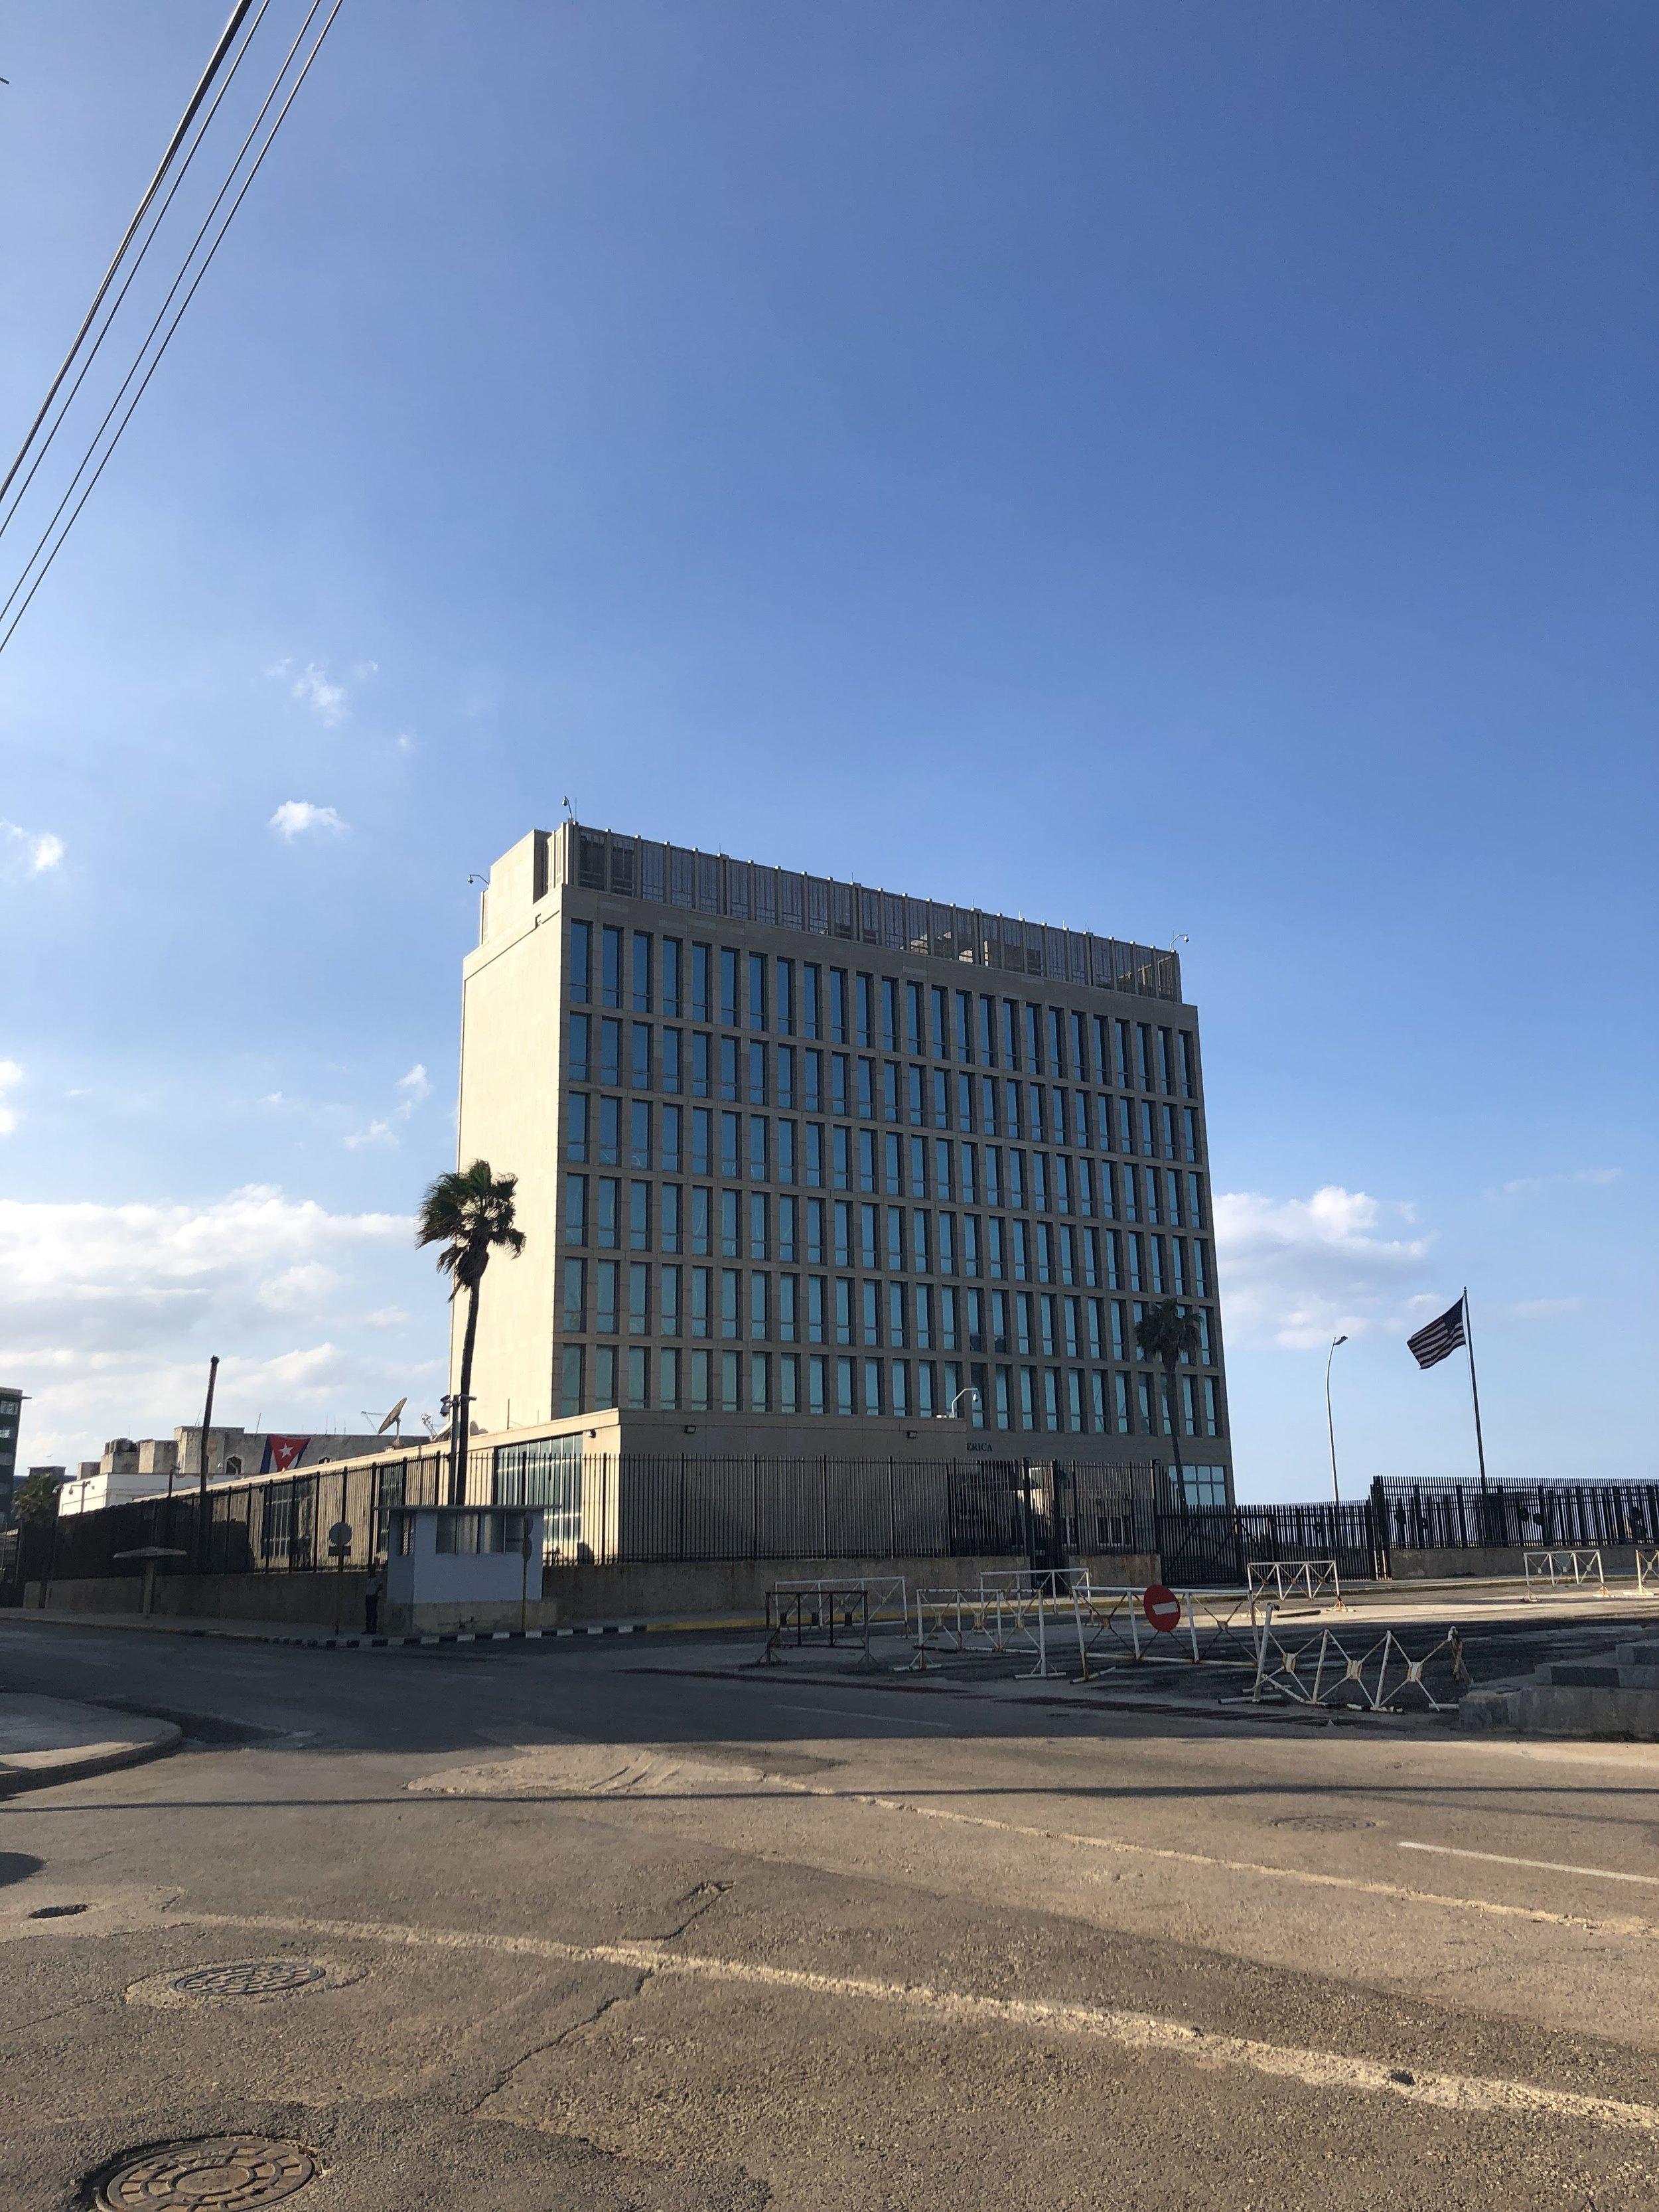 The U.S. Embassy